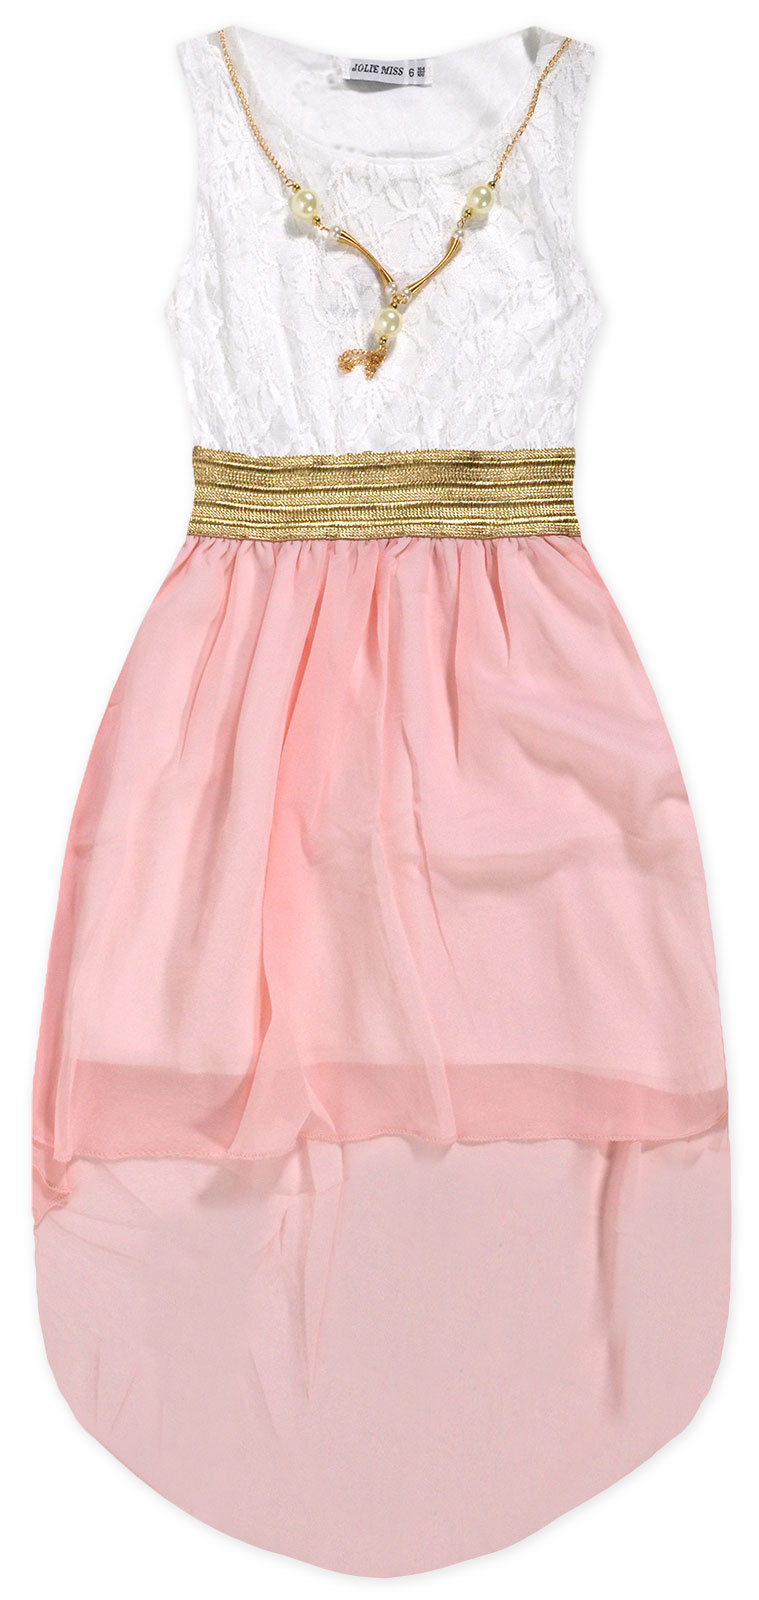 Girls Vibrant Party Dress New Kids Chiffon Skirt Lace Top Dresses ...